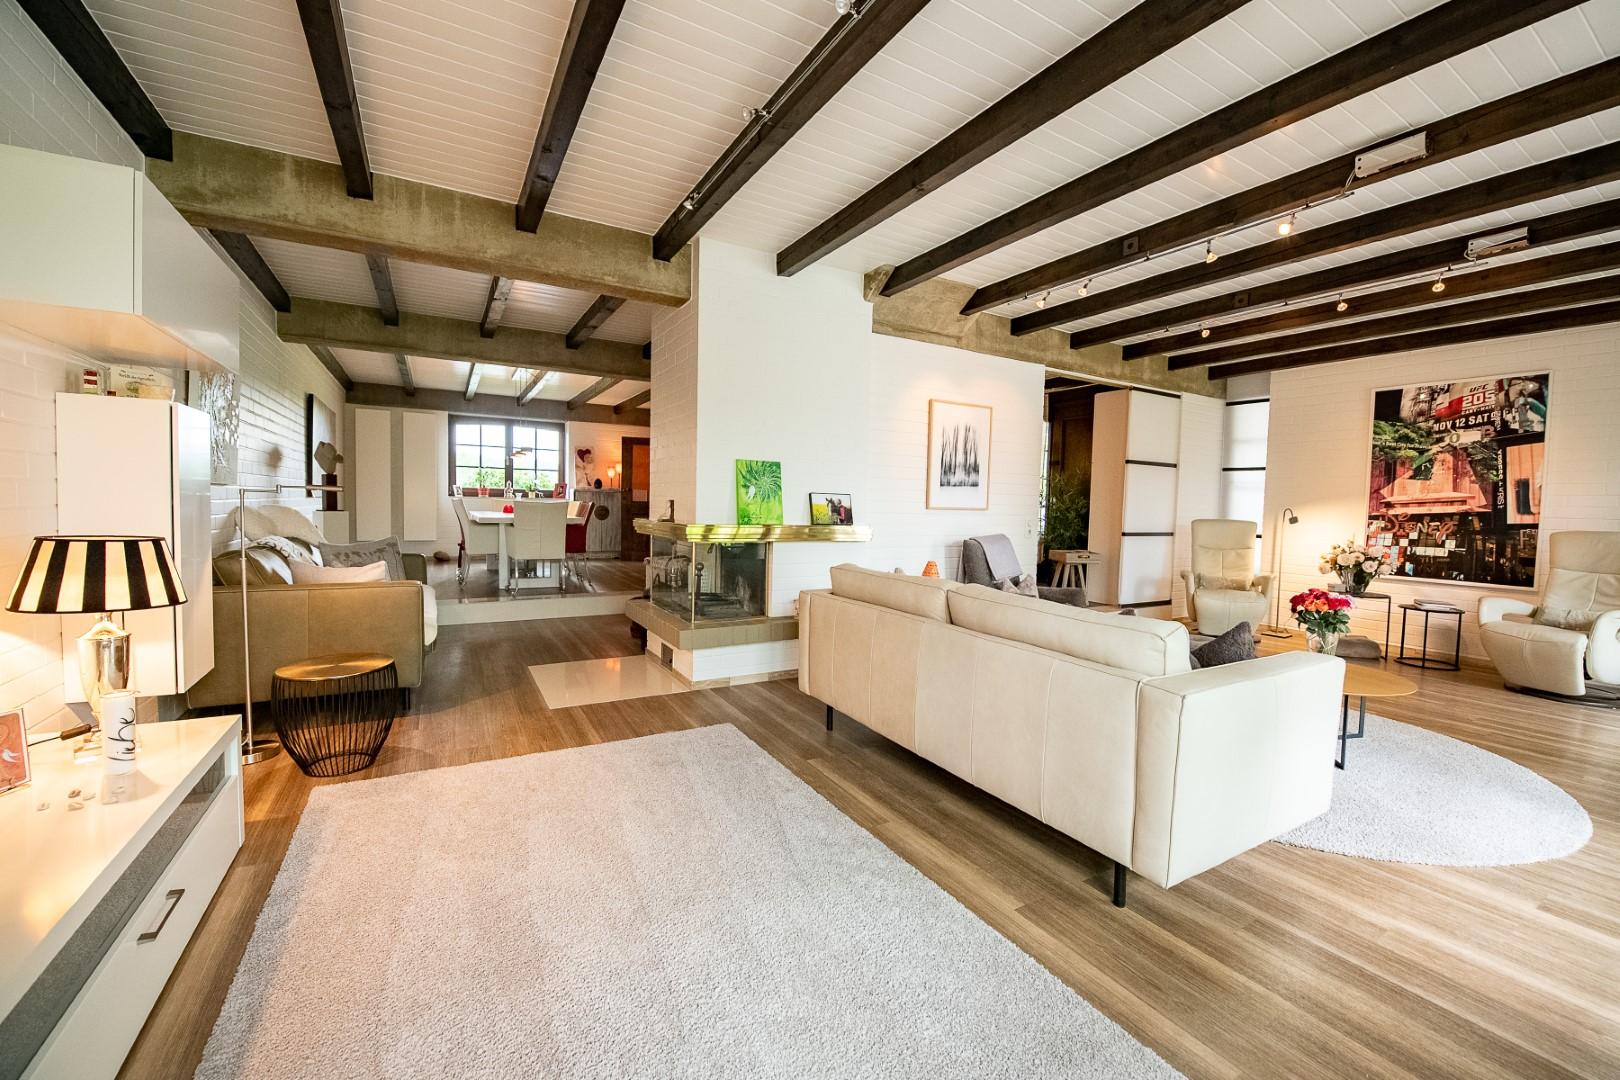 Immobilie Nr.0356 | , 40670 Meerbusch - Osterath